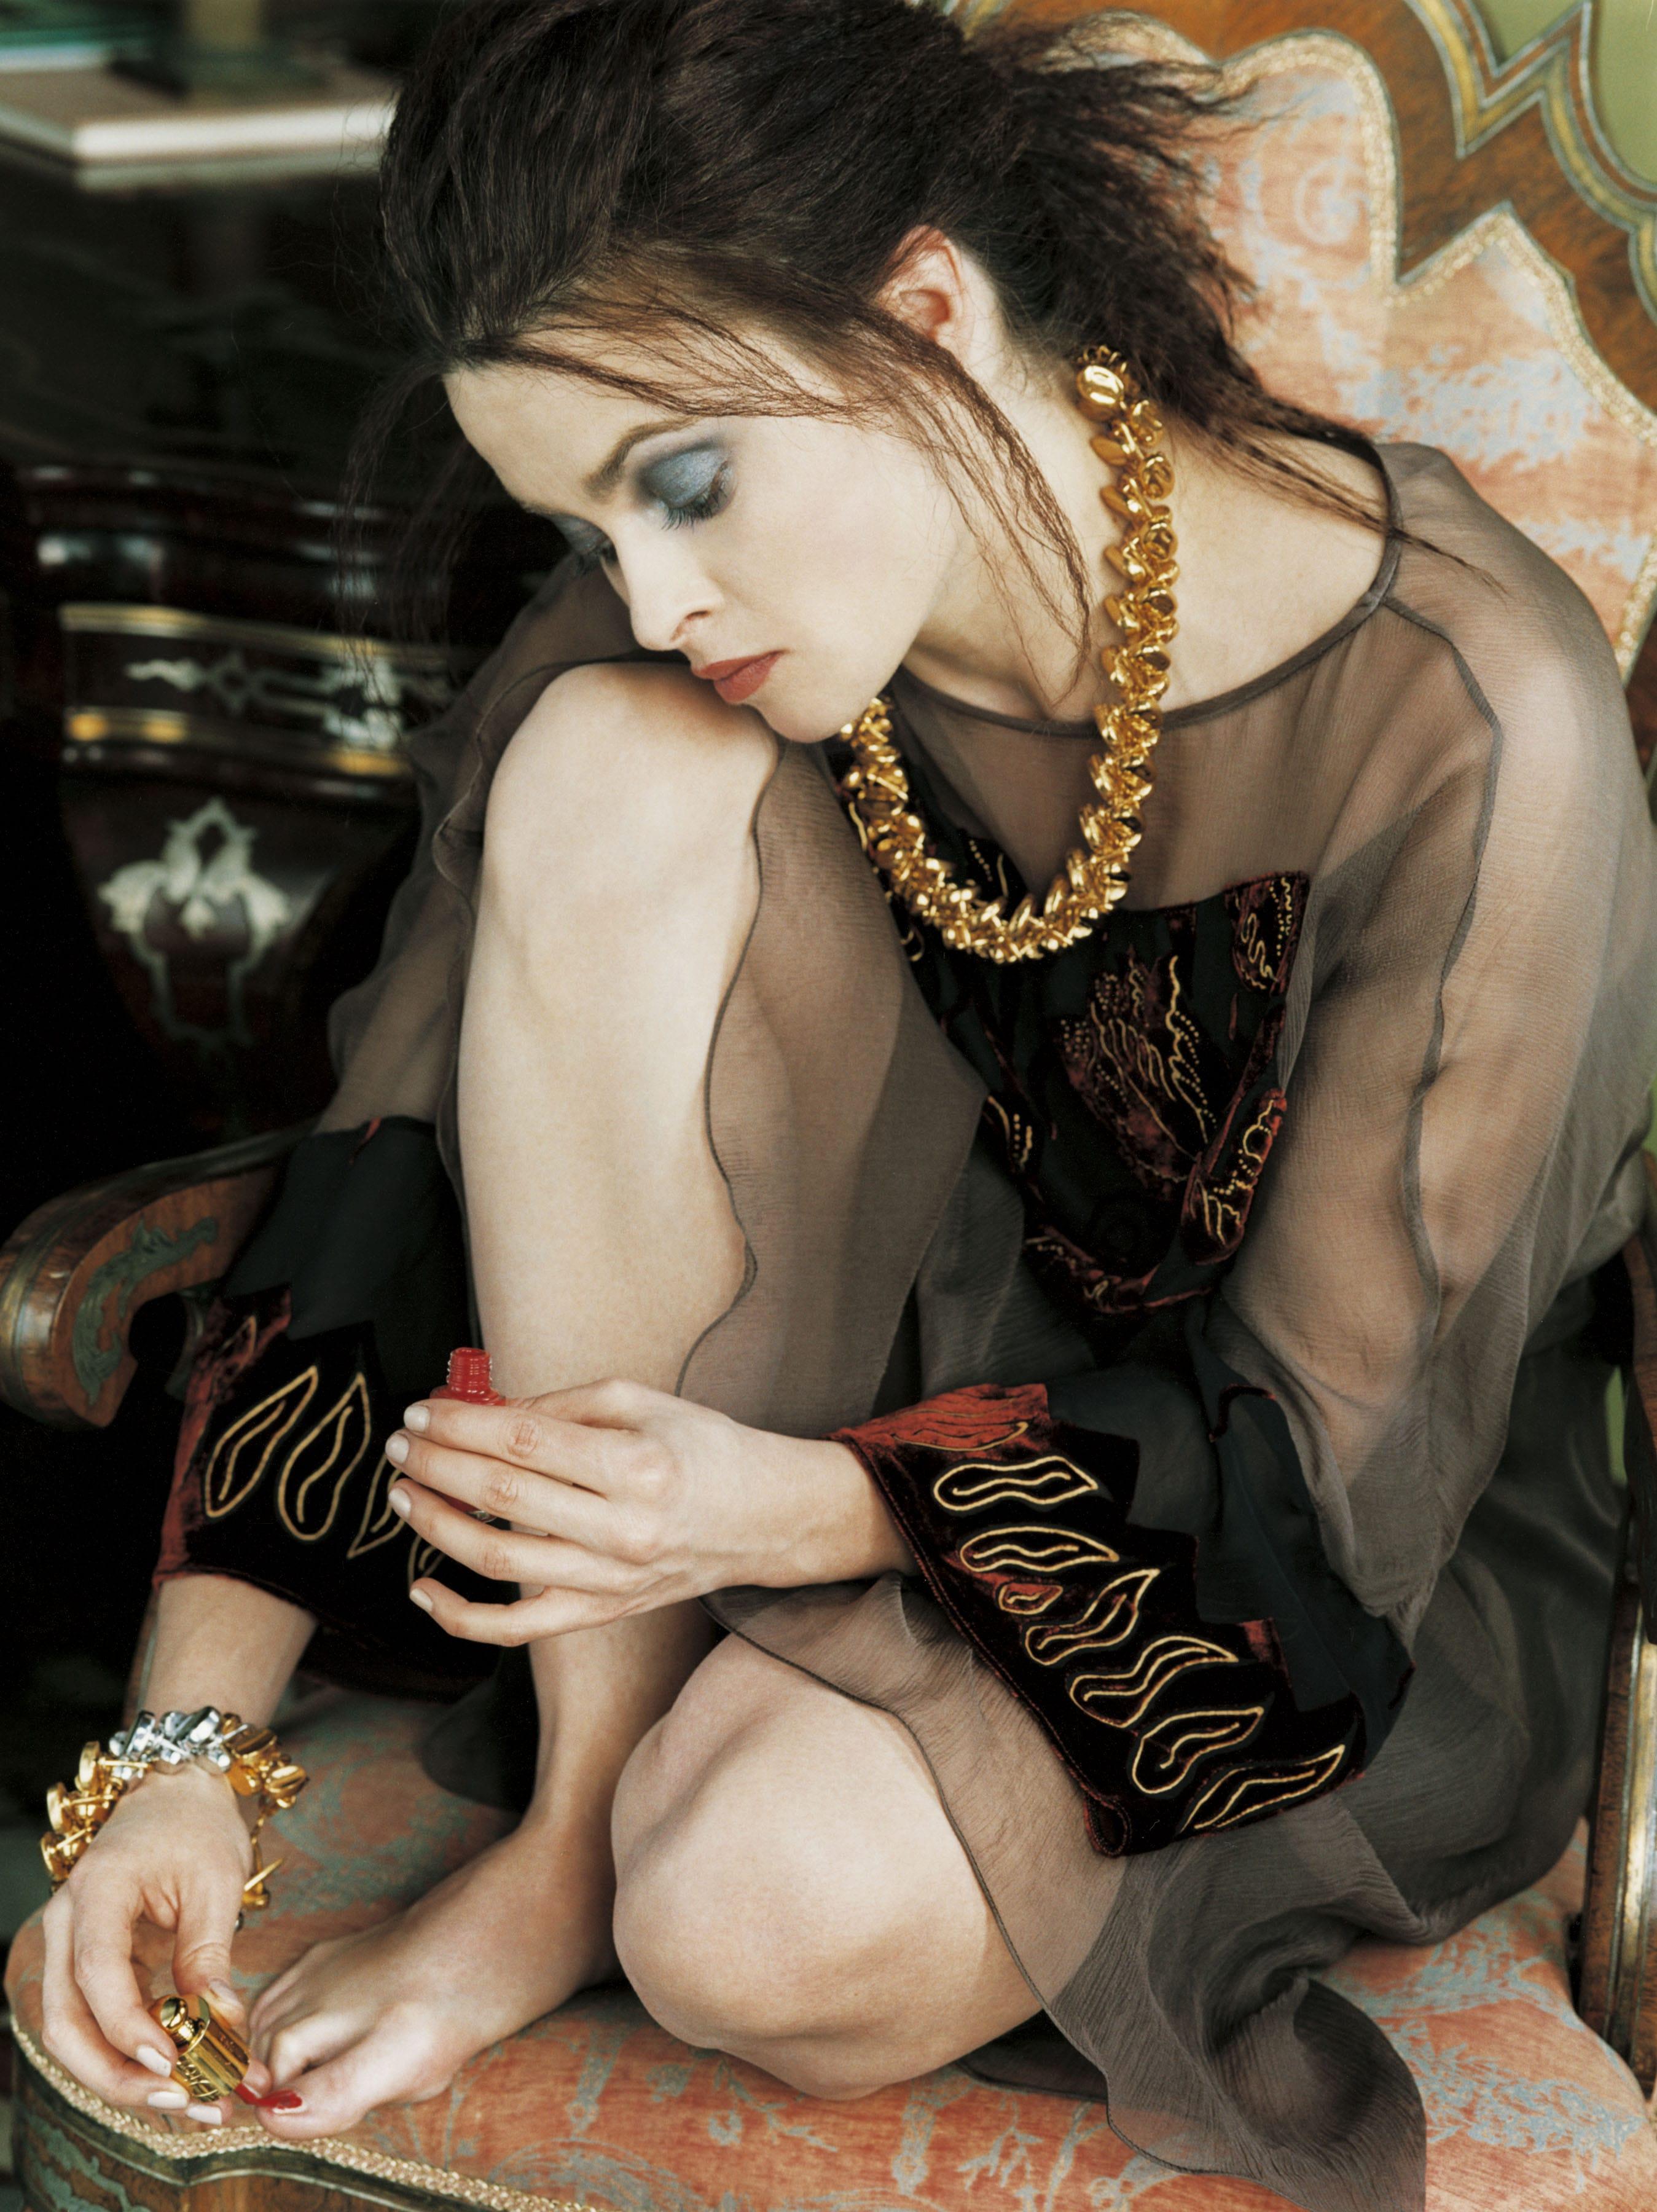 Helena Bonham Carter For mobile